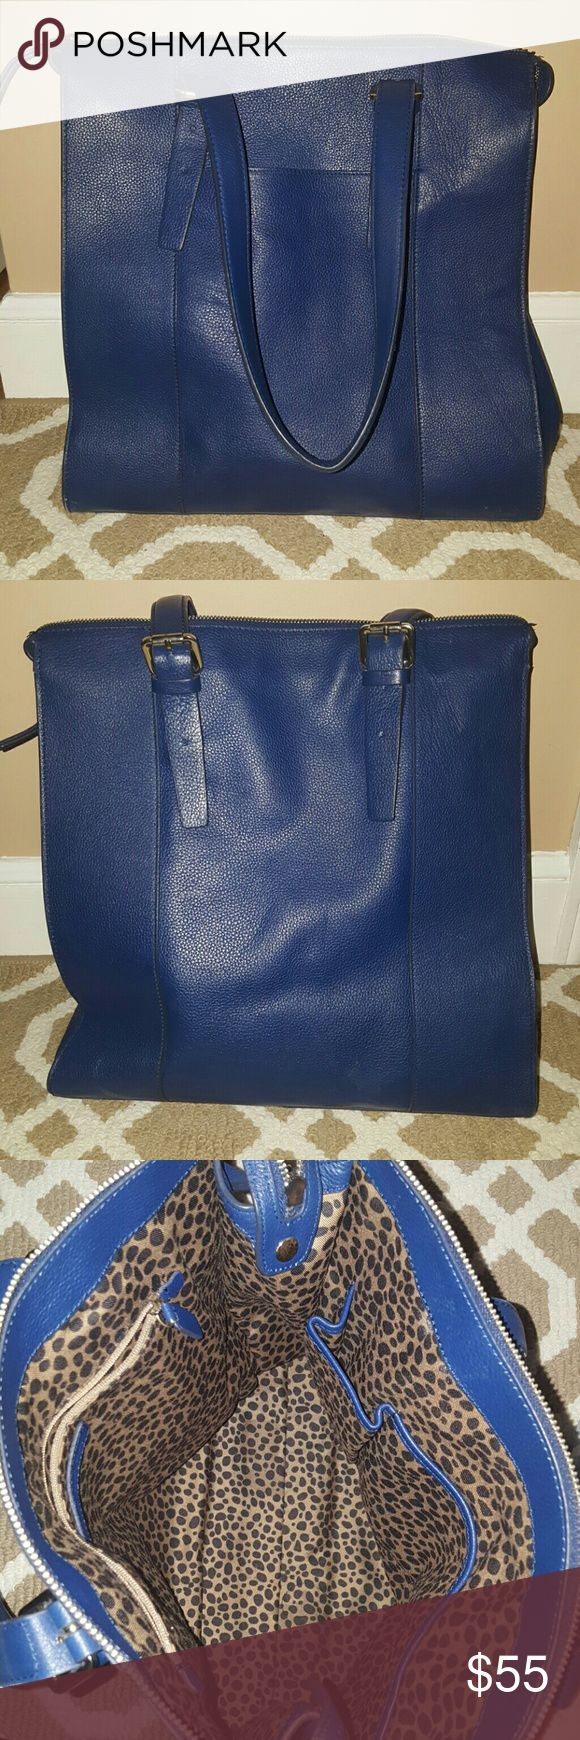 Banana Republic Large Handbag Navy Blue, large tote, shoulder bag, gold details such as zipper and buckles, gently used Banana Republic Bags Shoulder Bags